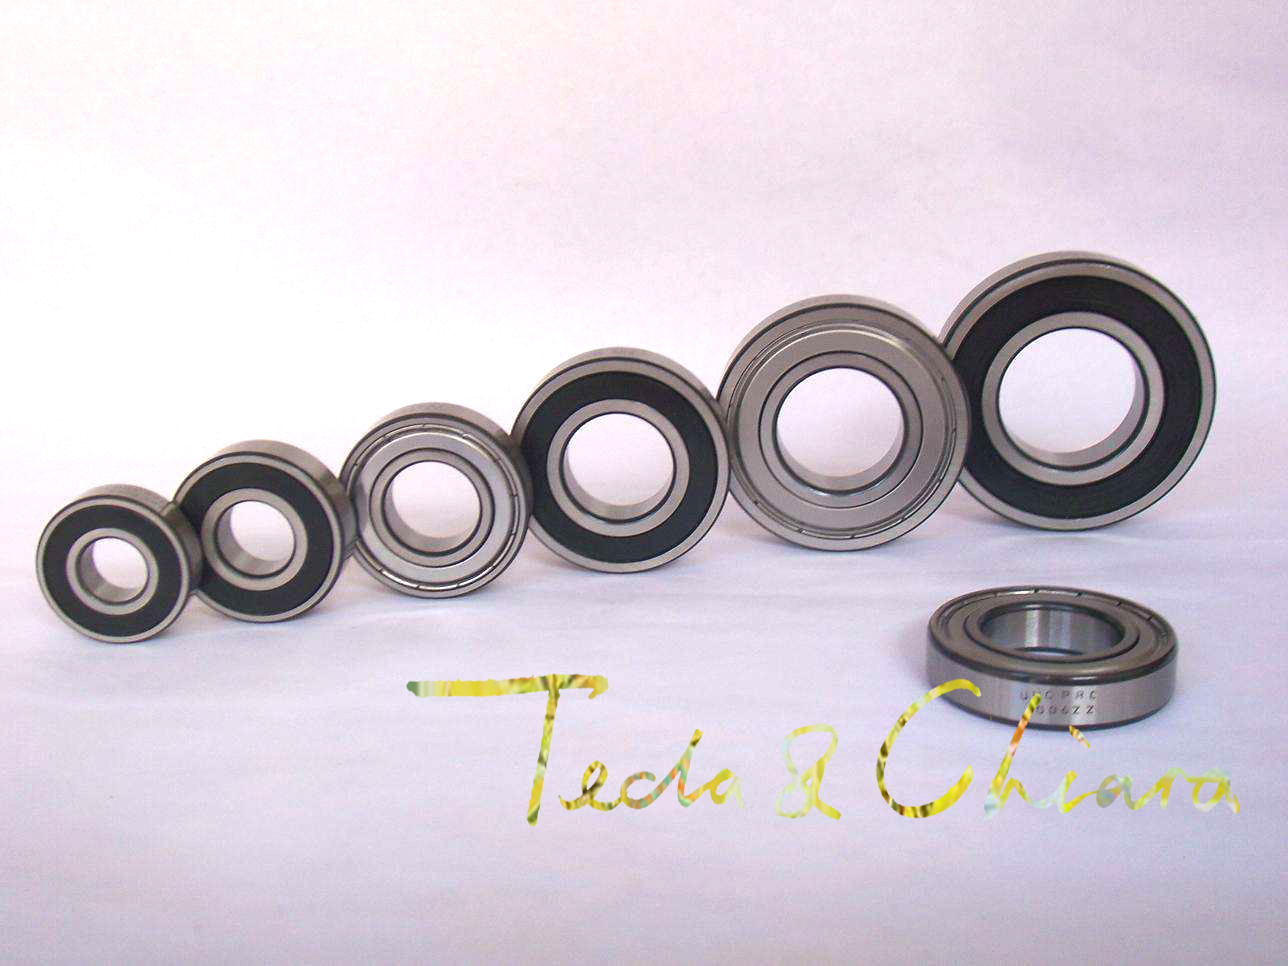 6902 6902ZZ 6902RS 6902-2Z 6902Z 6902-2RS ZZ RS RZ 2RZ Deep Groove Ball Bearings 15 x 28 x 7mm High Quality mr74 674zz 674rs mr74zz mr74rs mr74 2z mr74z mr74 2rs 674 674z zz rs rz 2rz deep groove ball bearings 4 x 7 x 2 5mm high quality